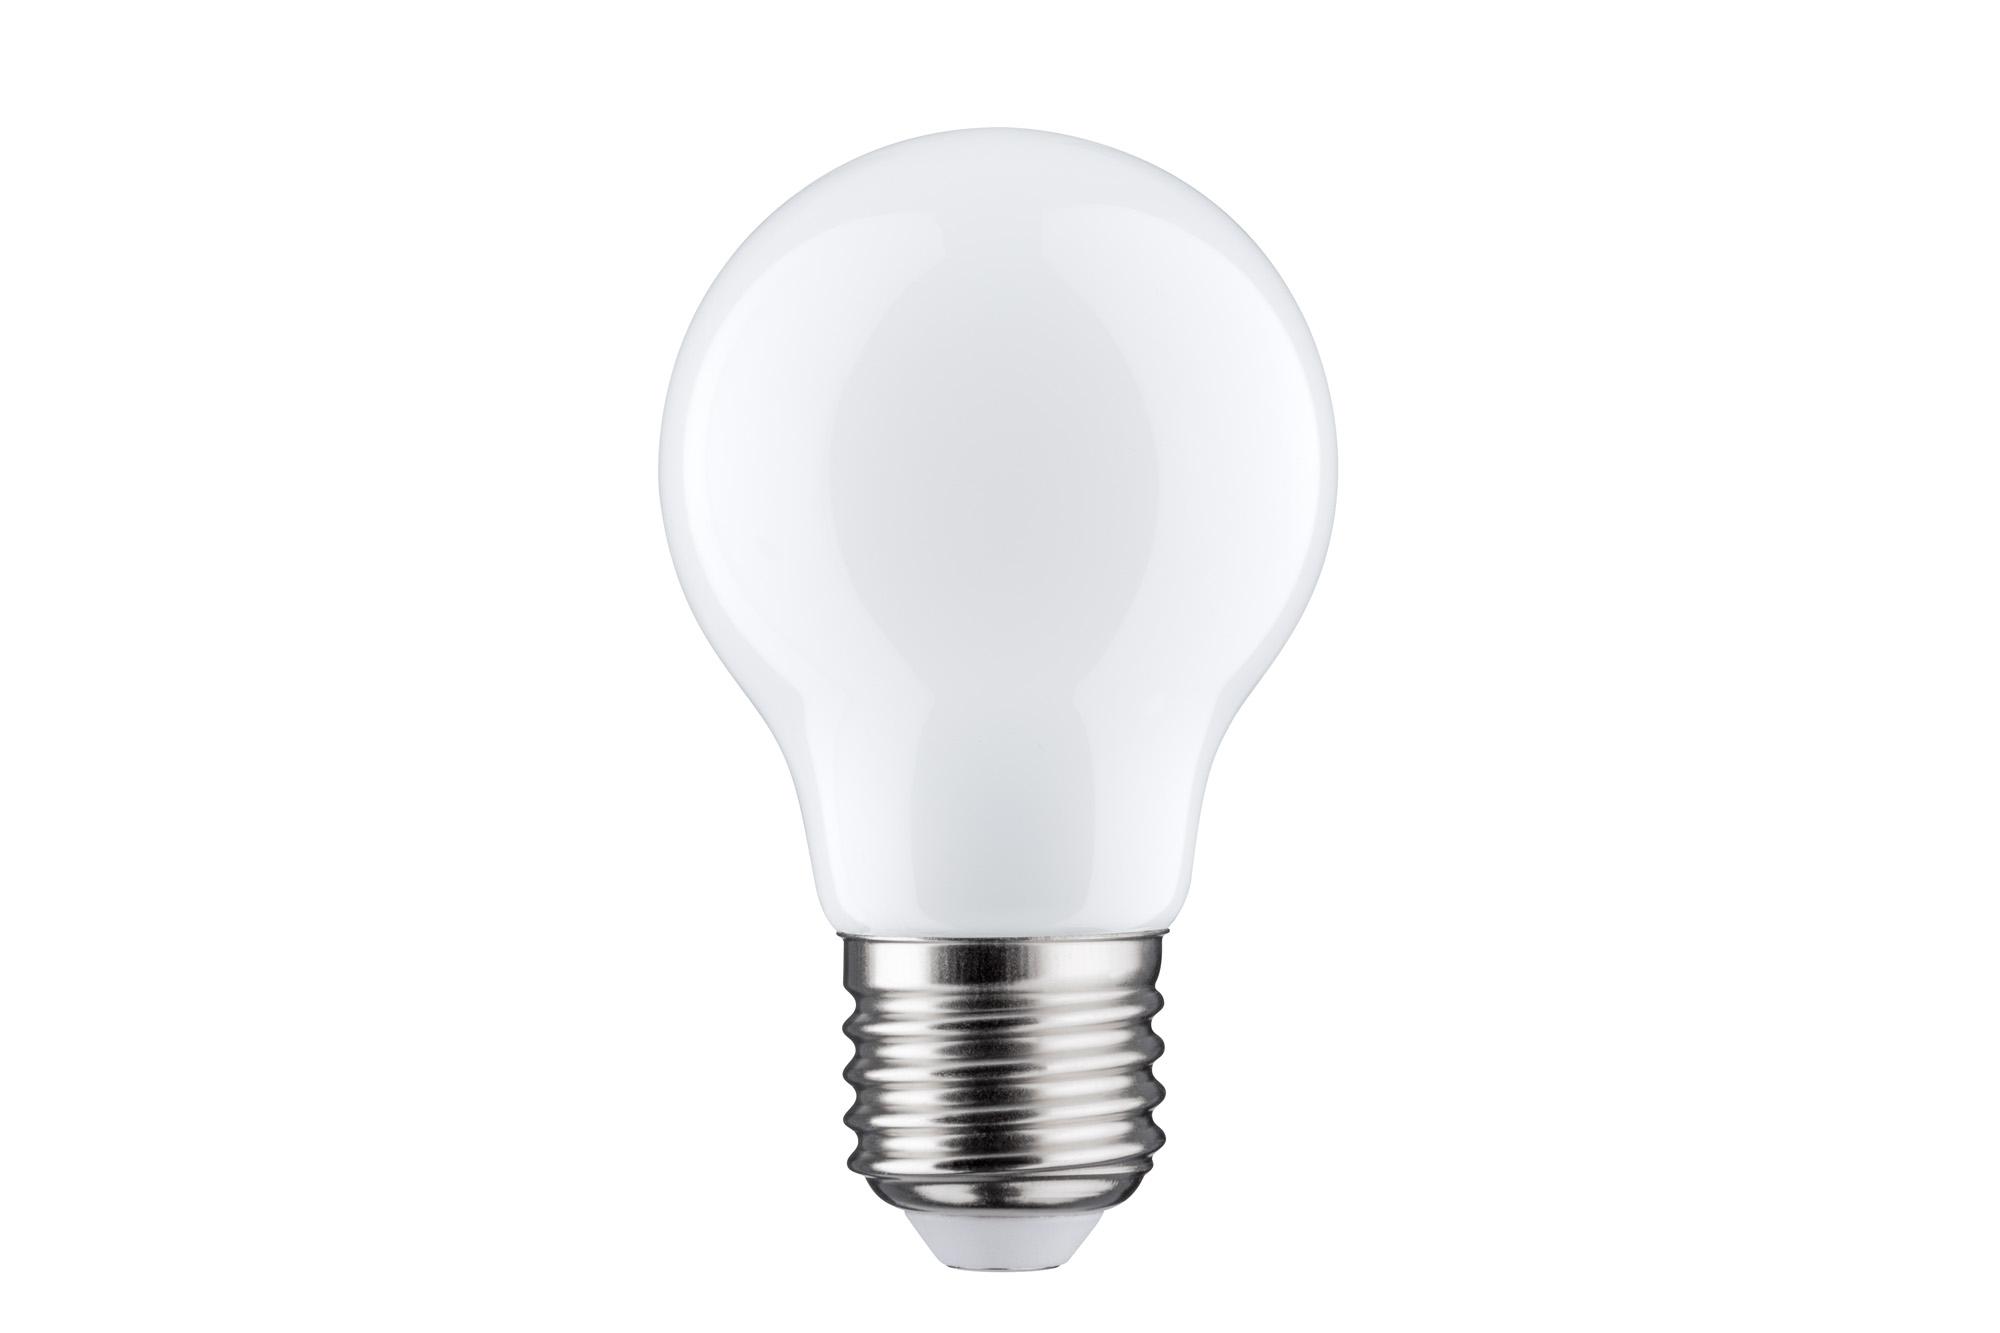 led allgebrauchslampe 6 watt e27 opal warmwei 28331. Black Bedroom Furniture Sets. Home Design Ideas